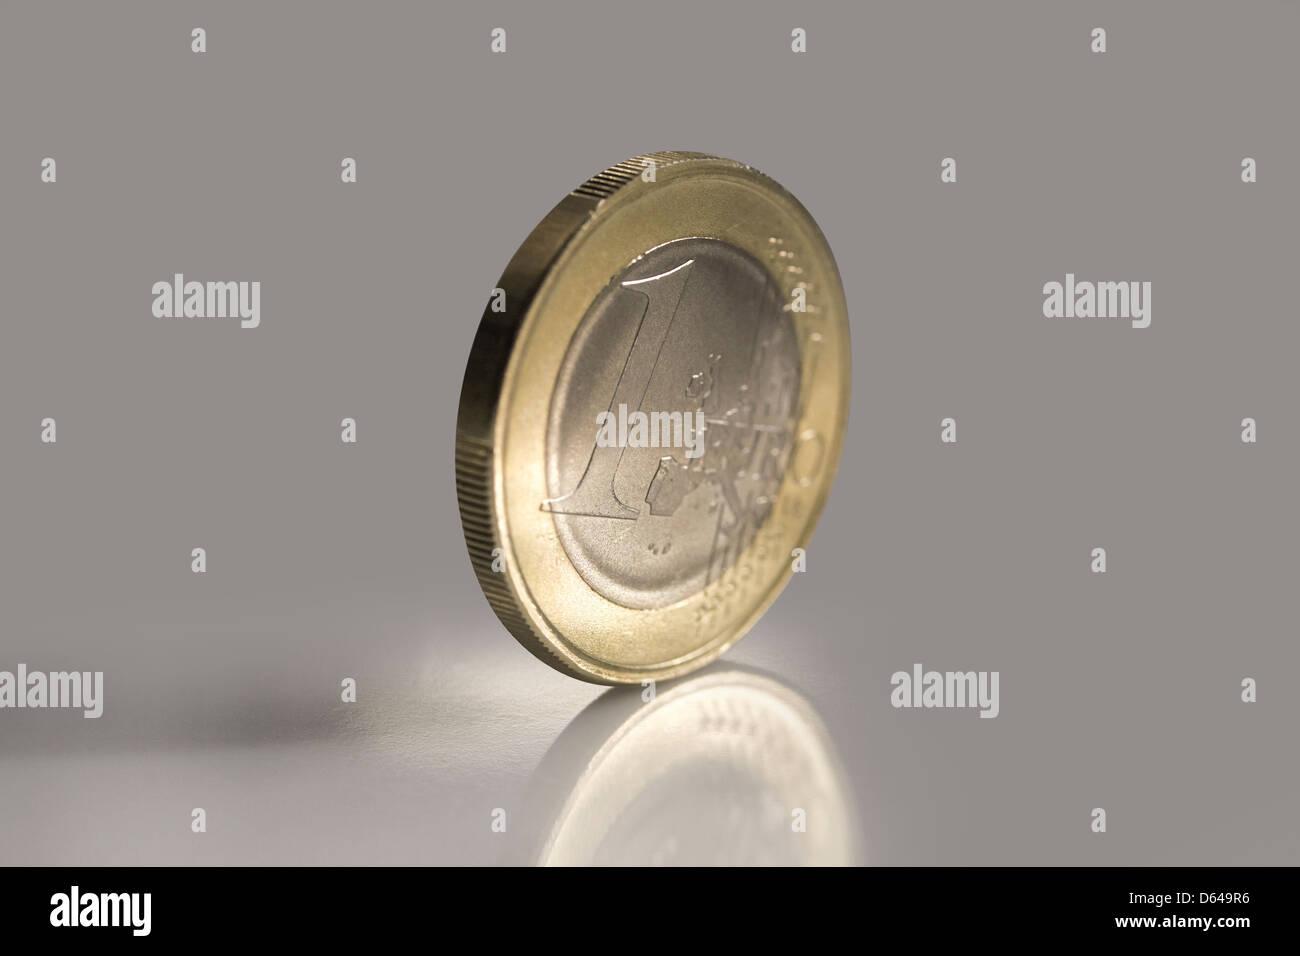 Macro shot of noble shining one Euro coin - Stock Image